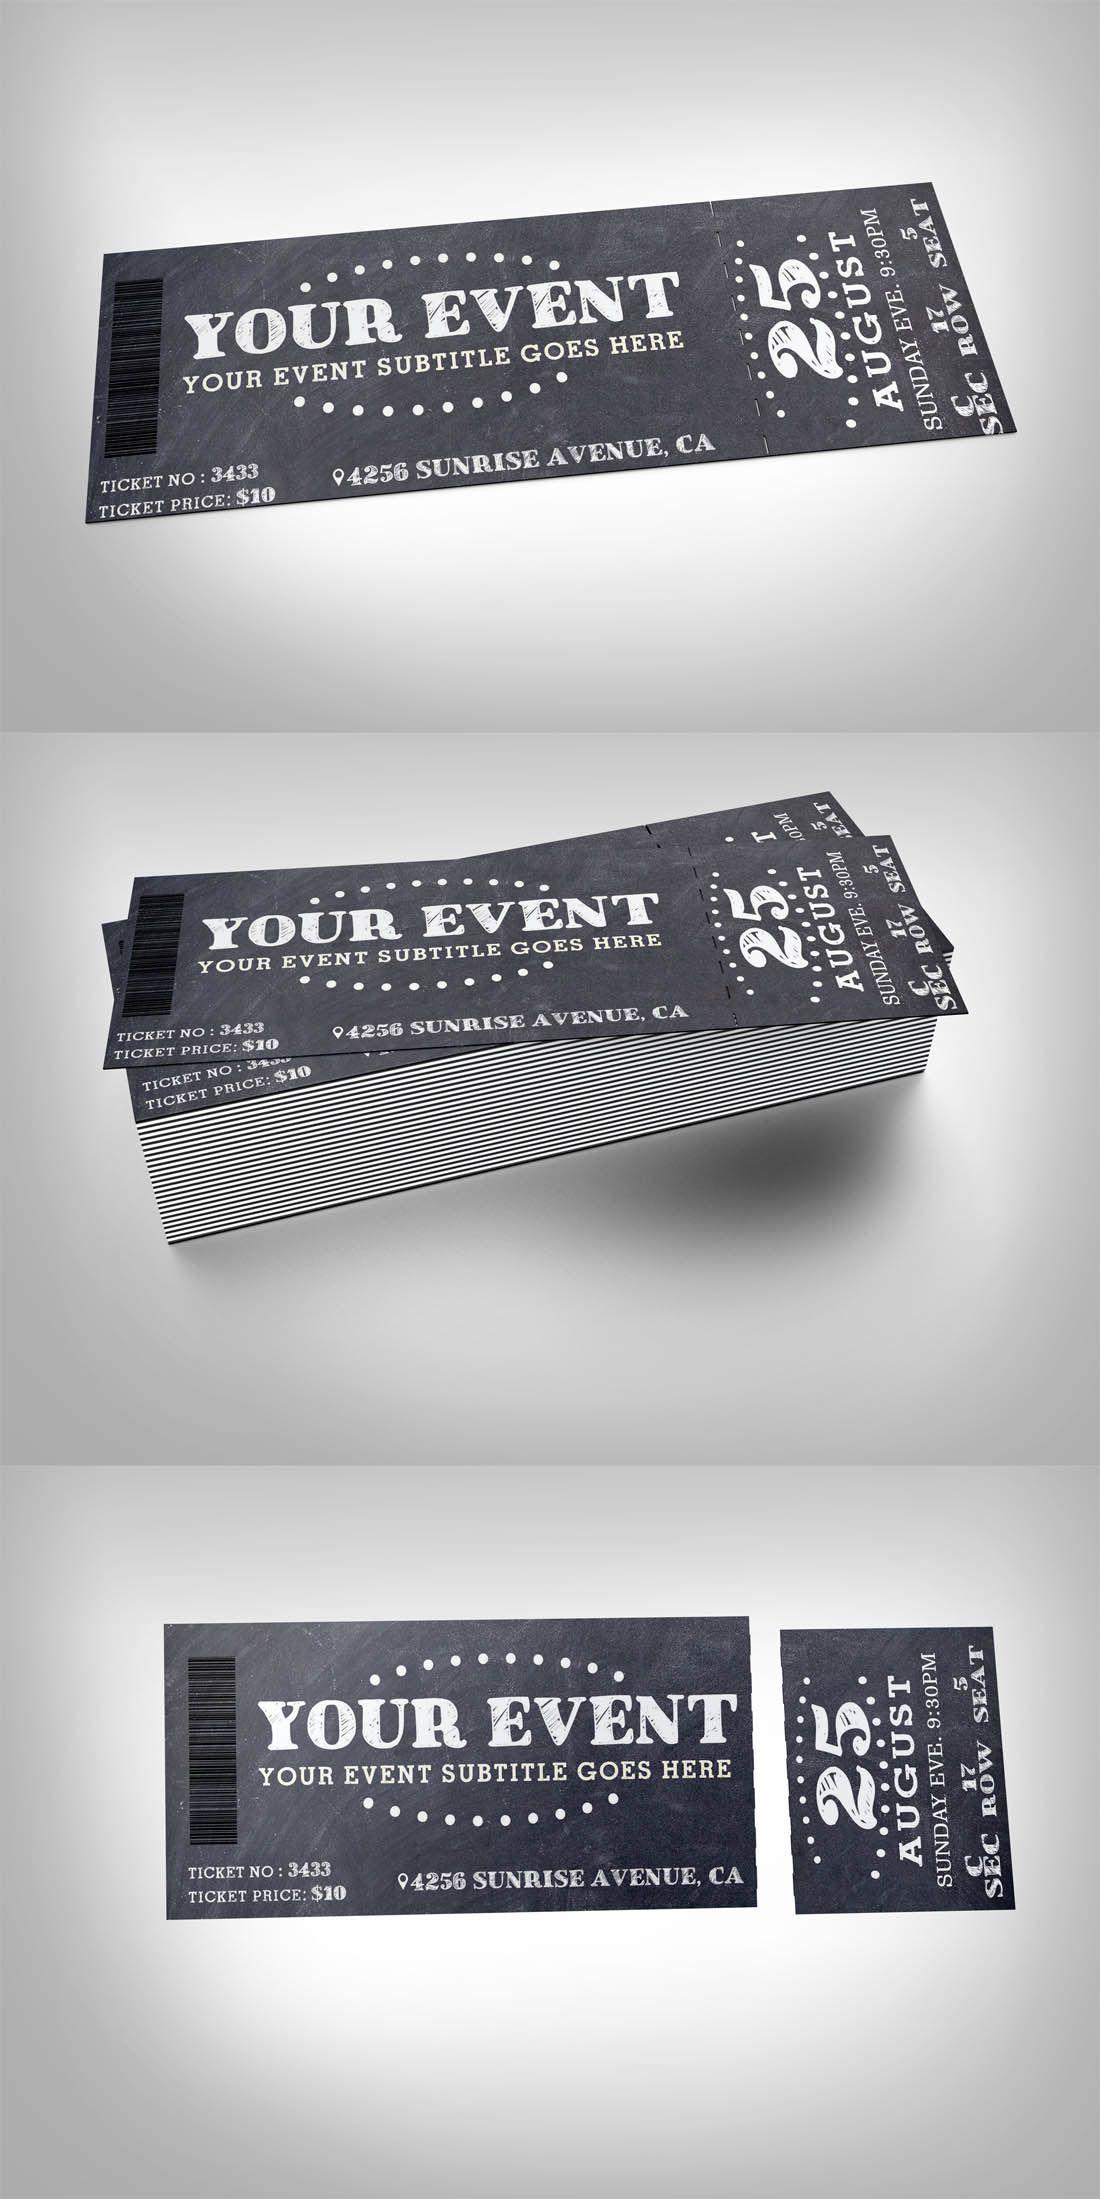 Chalkboard Event Ticket Template Design Buy Now Https Creativemarket Com Studioweb 339238 Chalkbo Event Tickets Design Ticket Design Ticket Design Template